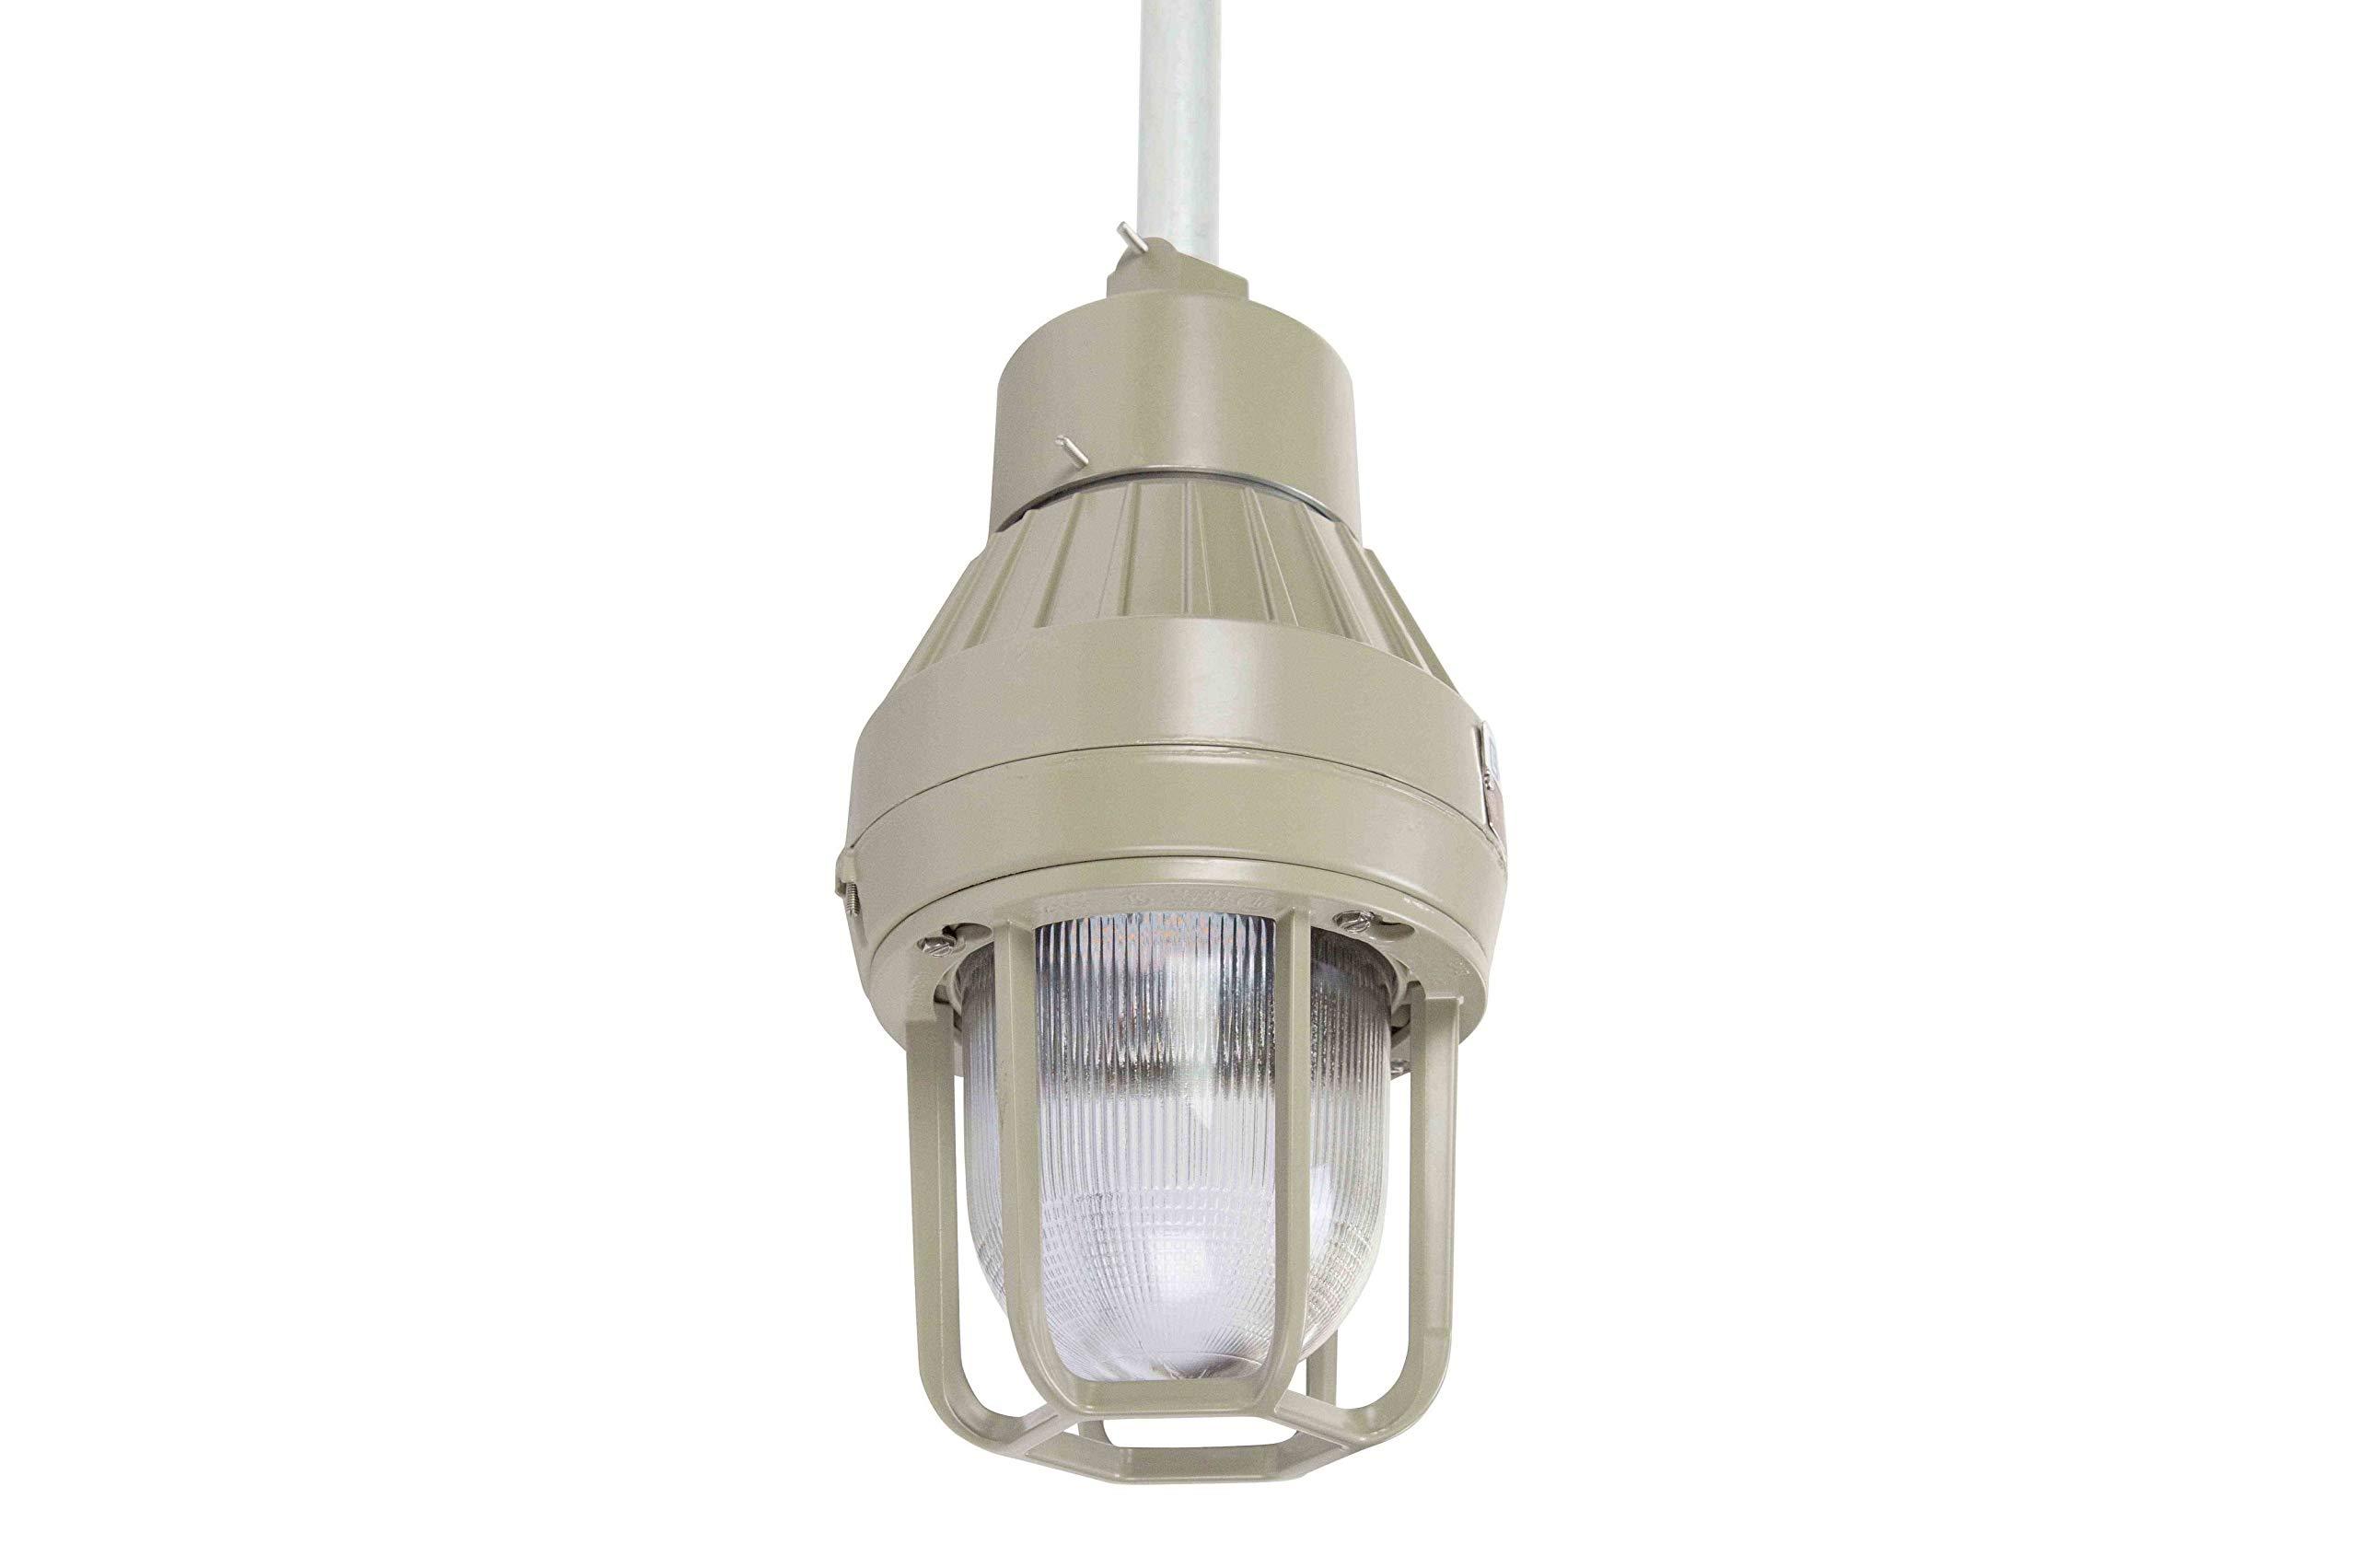 Larson Electronics 0321OXASBRA Explosion Proof LED Strobe Light - 4Hz Flash Rate - 10W - 1050 lm - Class I, Div. I - IP67 (1227VAC-Red-Pendant)